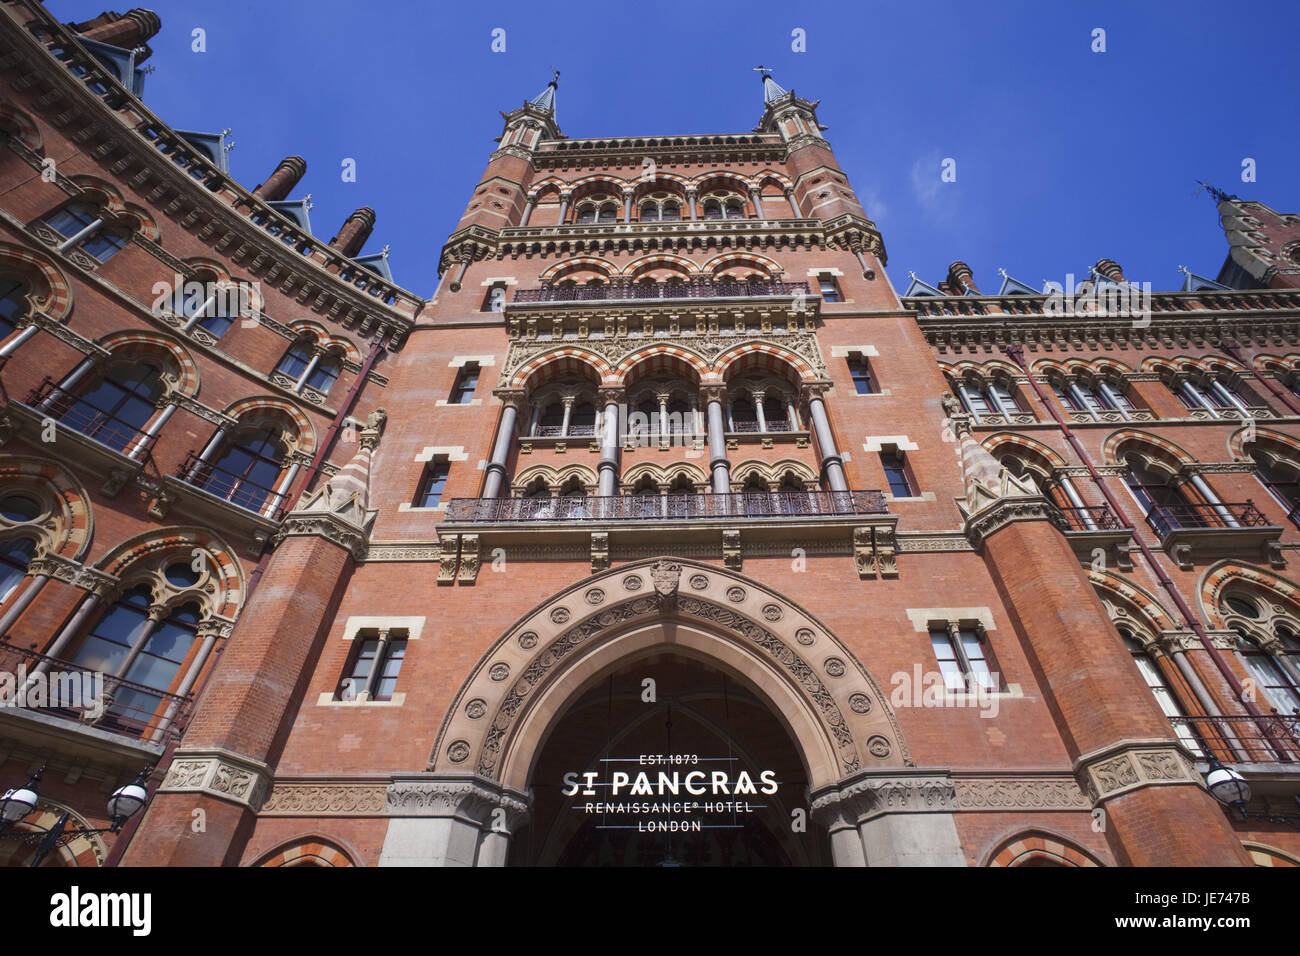 England, London, St. Pancras, Marriot Renaissance hotel, outside, UK, GB, hotel, gastronomy, 5-star hotel, facade, - Stock Image